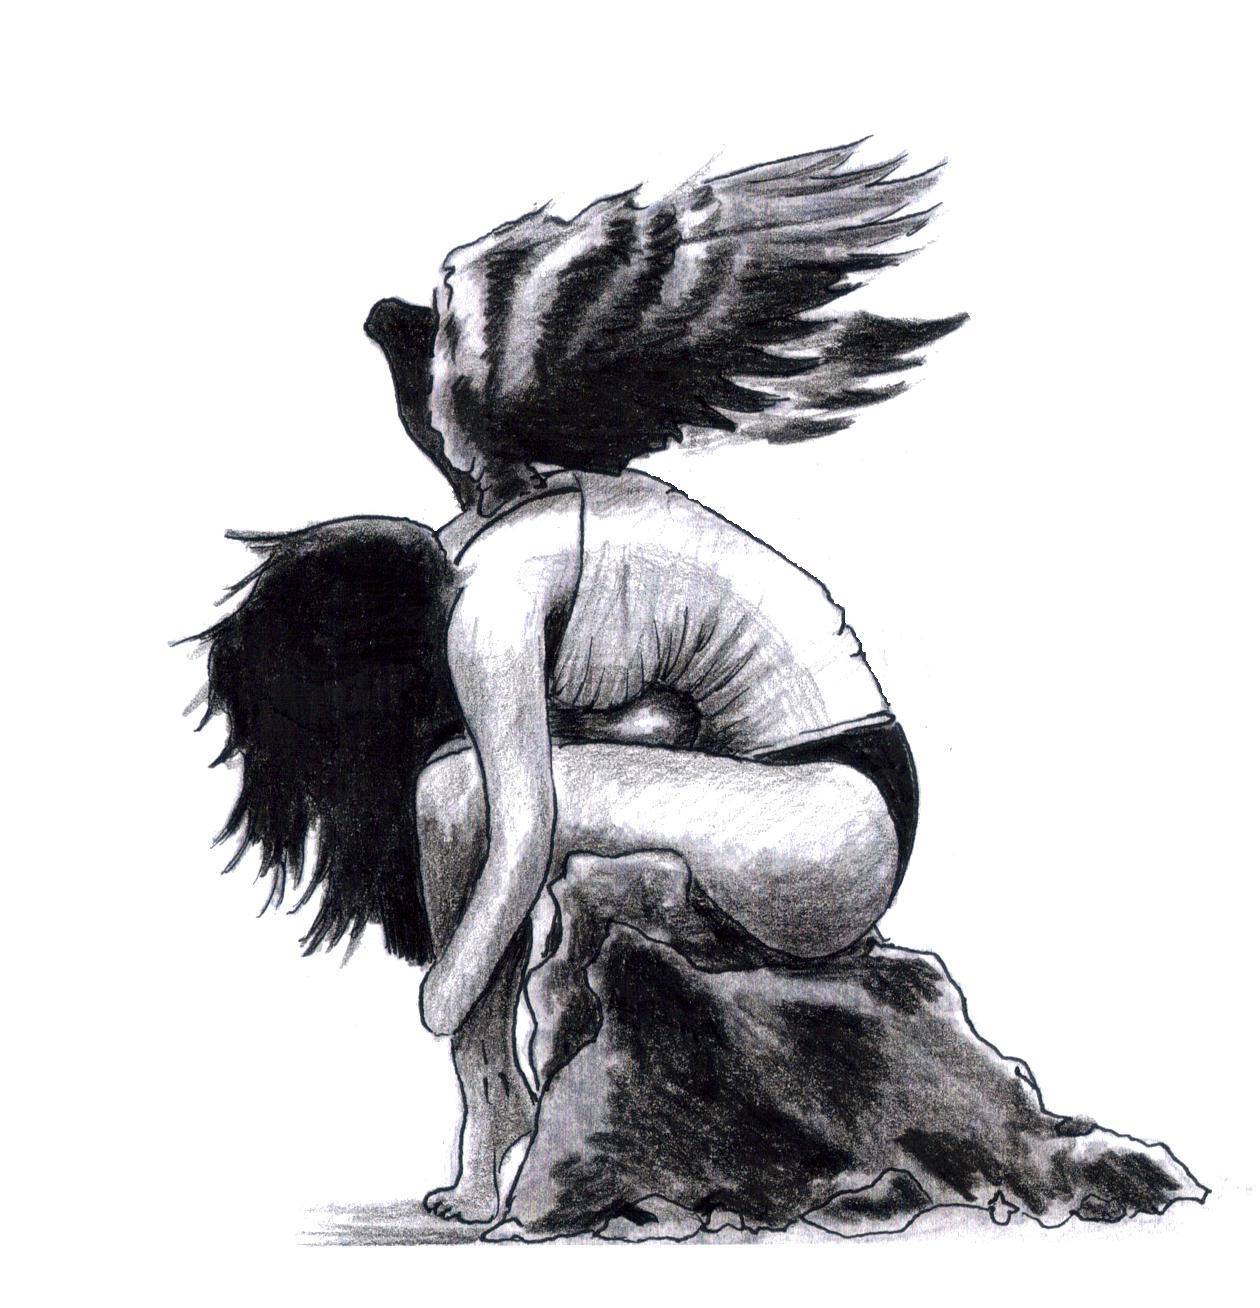 Fallen angel 2 by wikkedone on deviantart fallen angel 2 by wikkedone fallen angel 2 by wikkedone thecheapjerseys Image collections